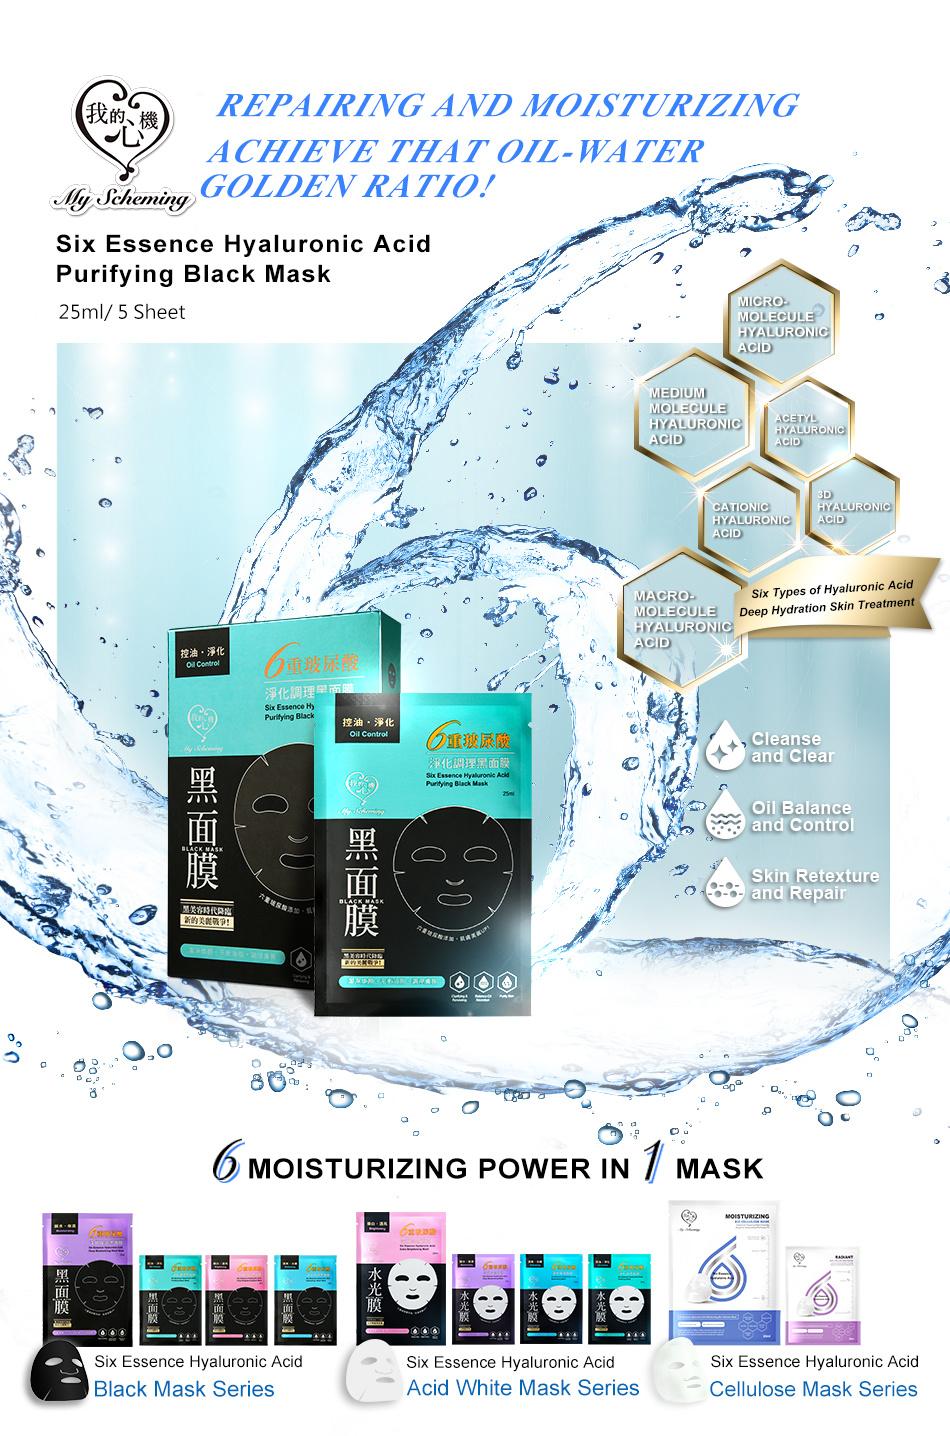 Six Essence Hyaluronic Acid Purifying Black Mask (5 Stk)-2